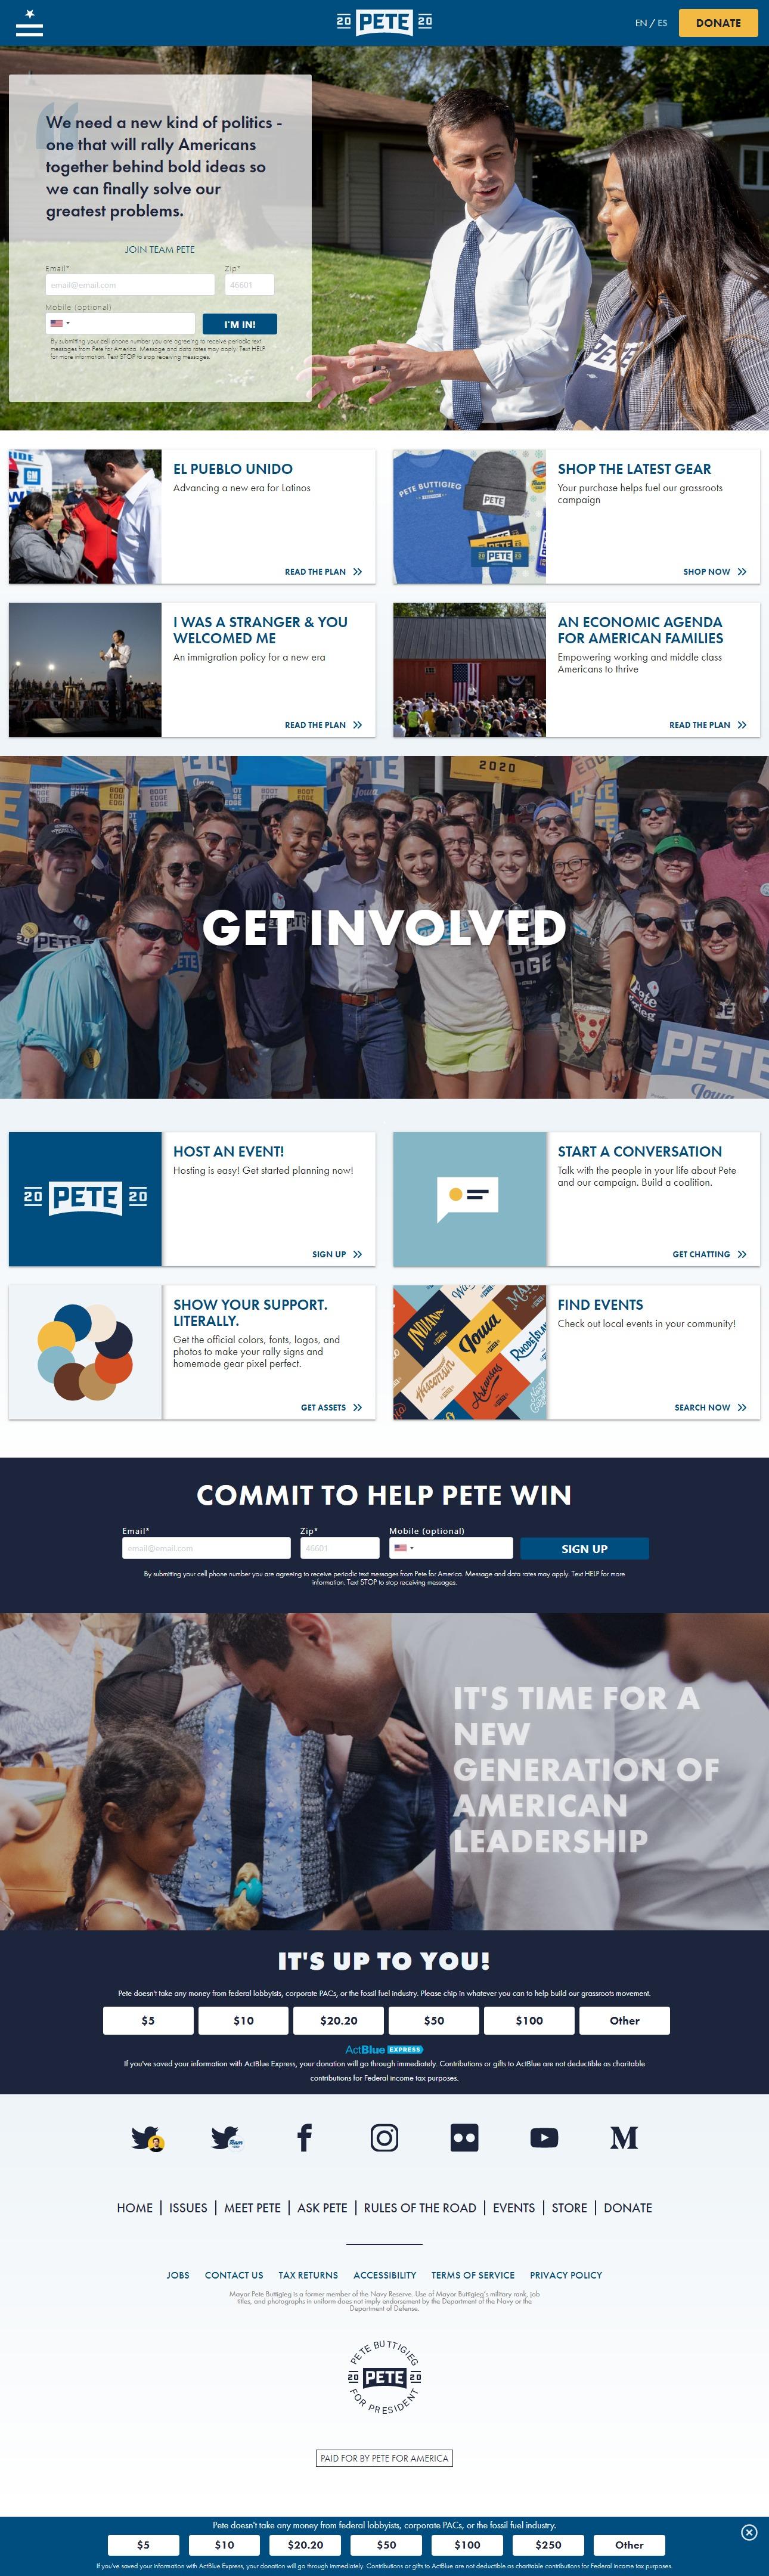 Homepage Snapshot for January 1, 2020: Mayor Pete Buttigieg